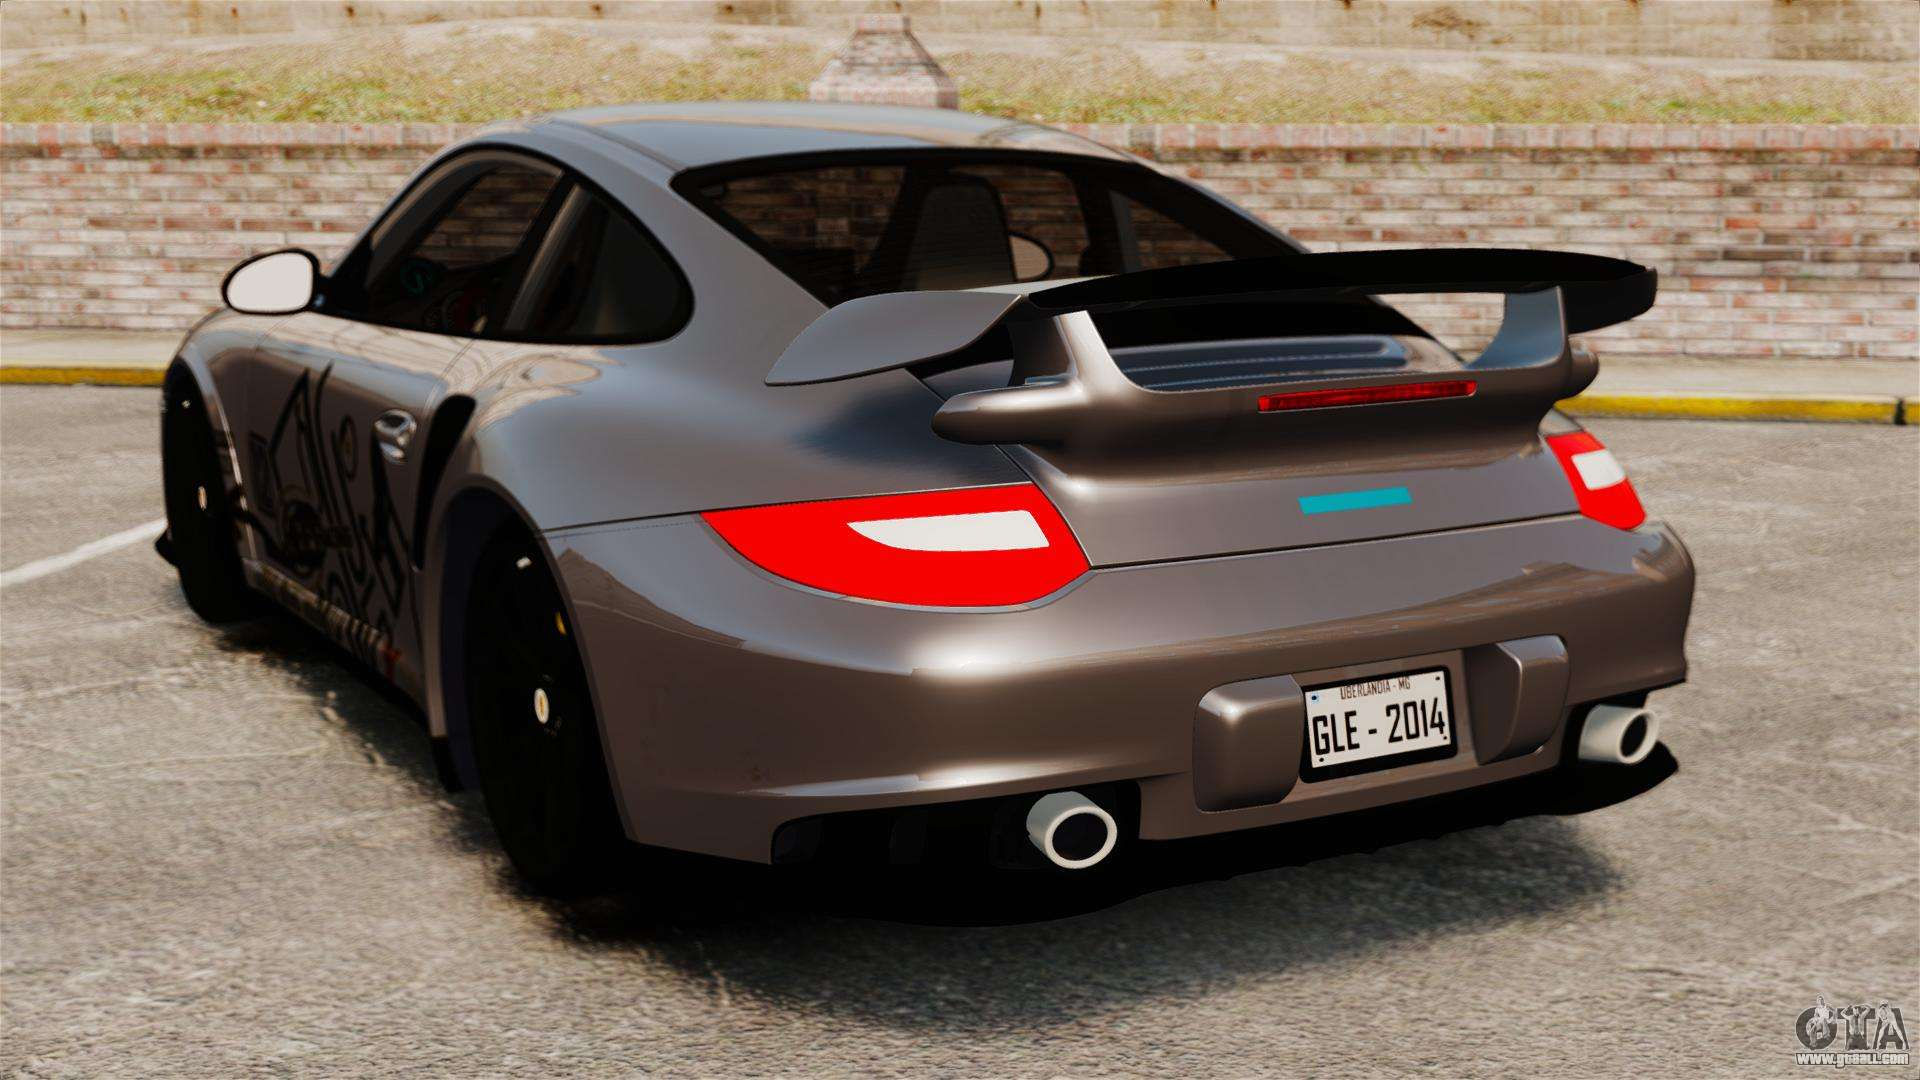 145239-GTAIV-2013-12-29-02-04-00-43 Remarkable Porsche 911 Gt2 Xbox 360 Cars Trend